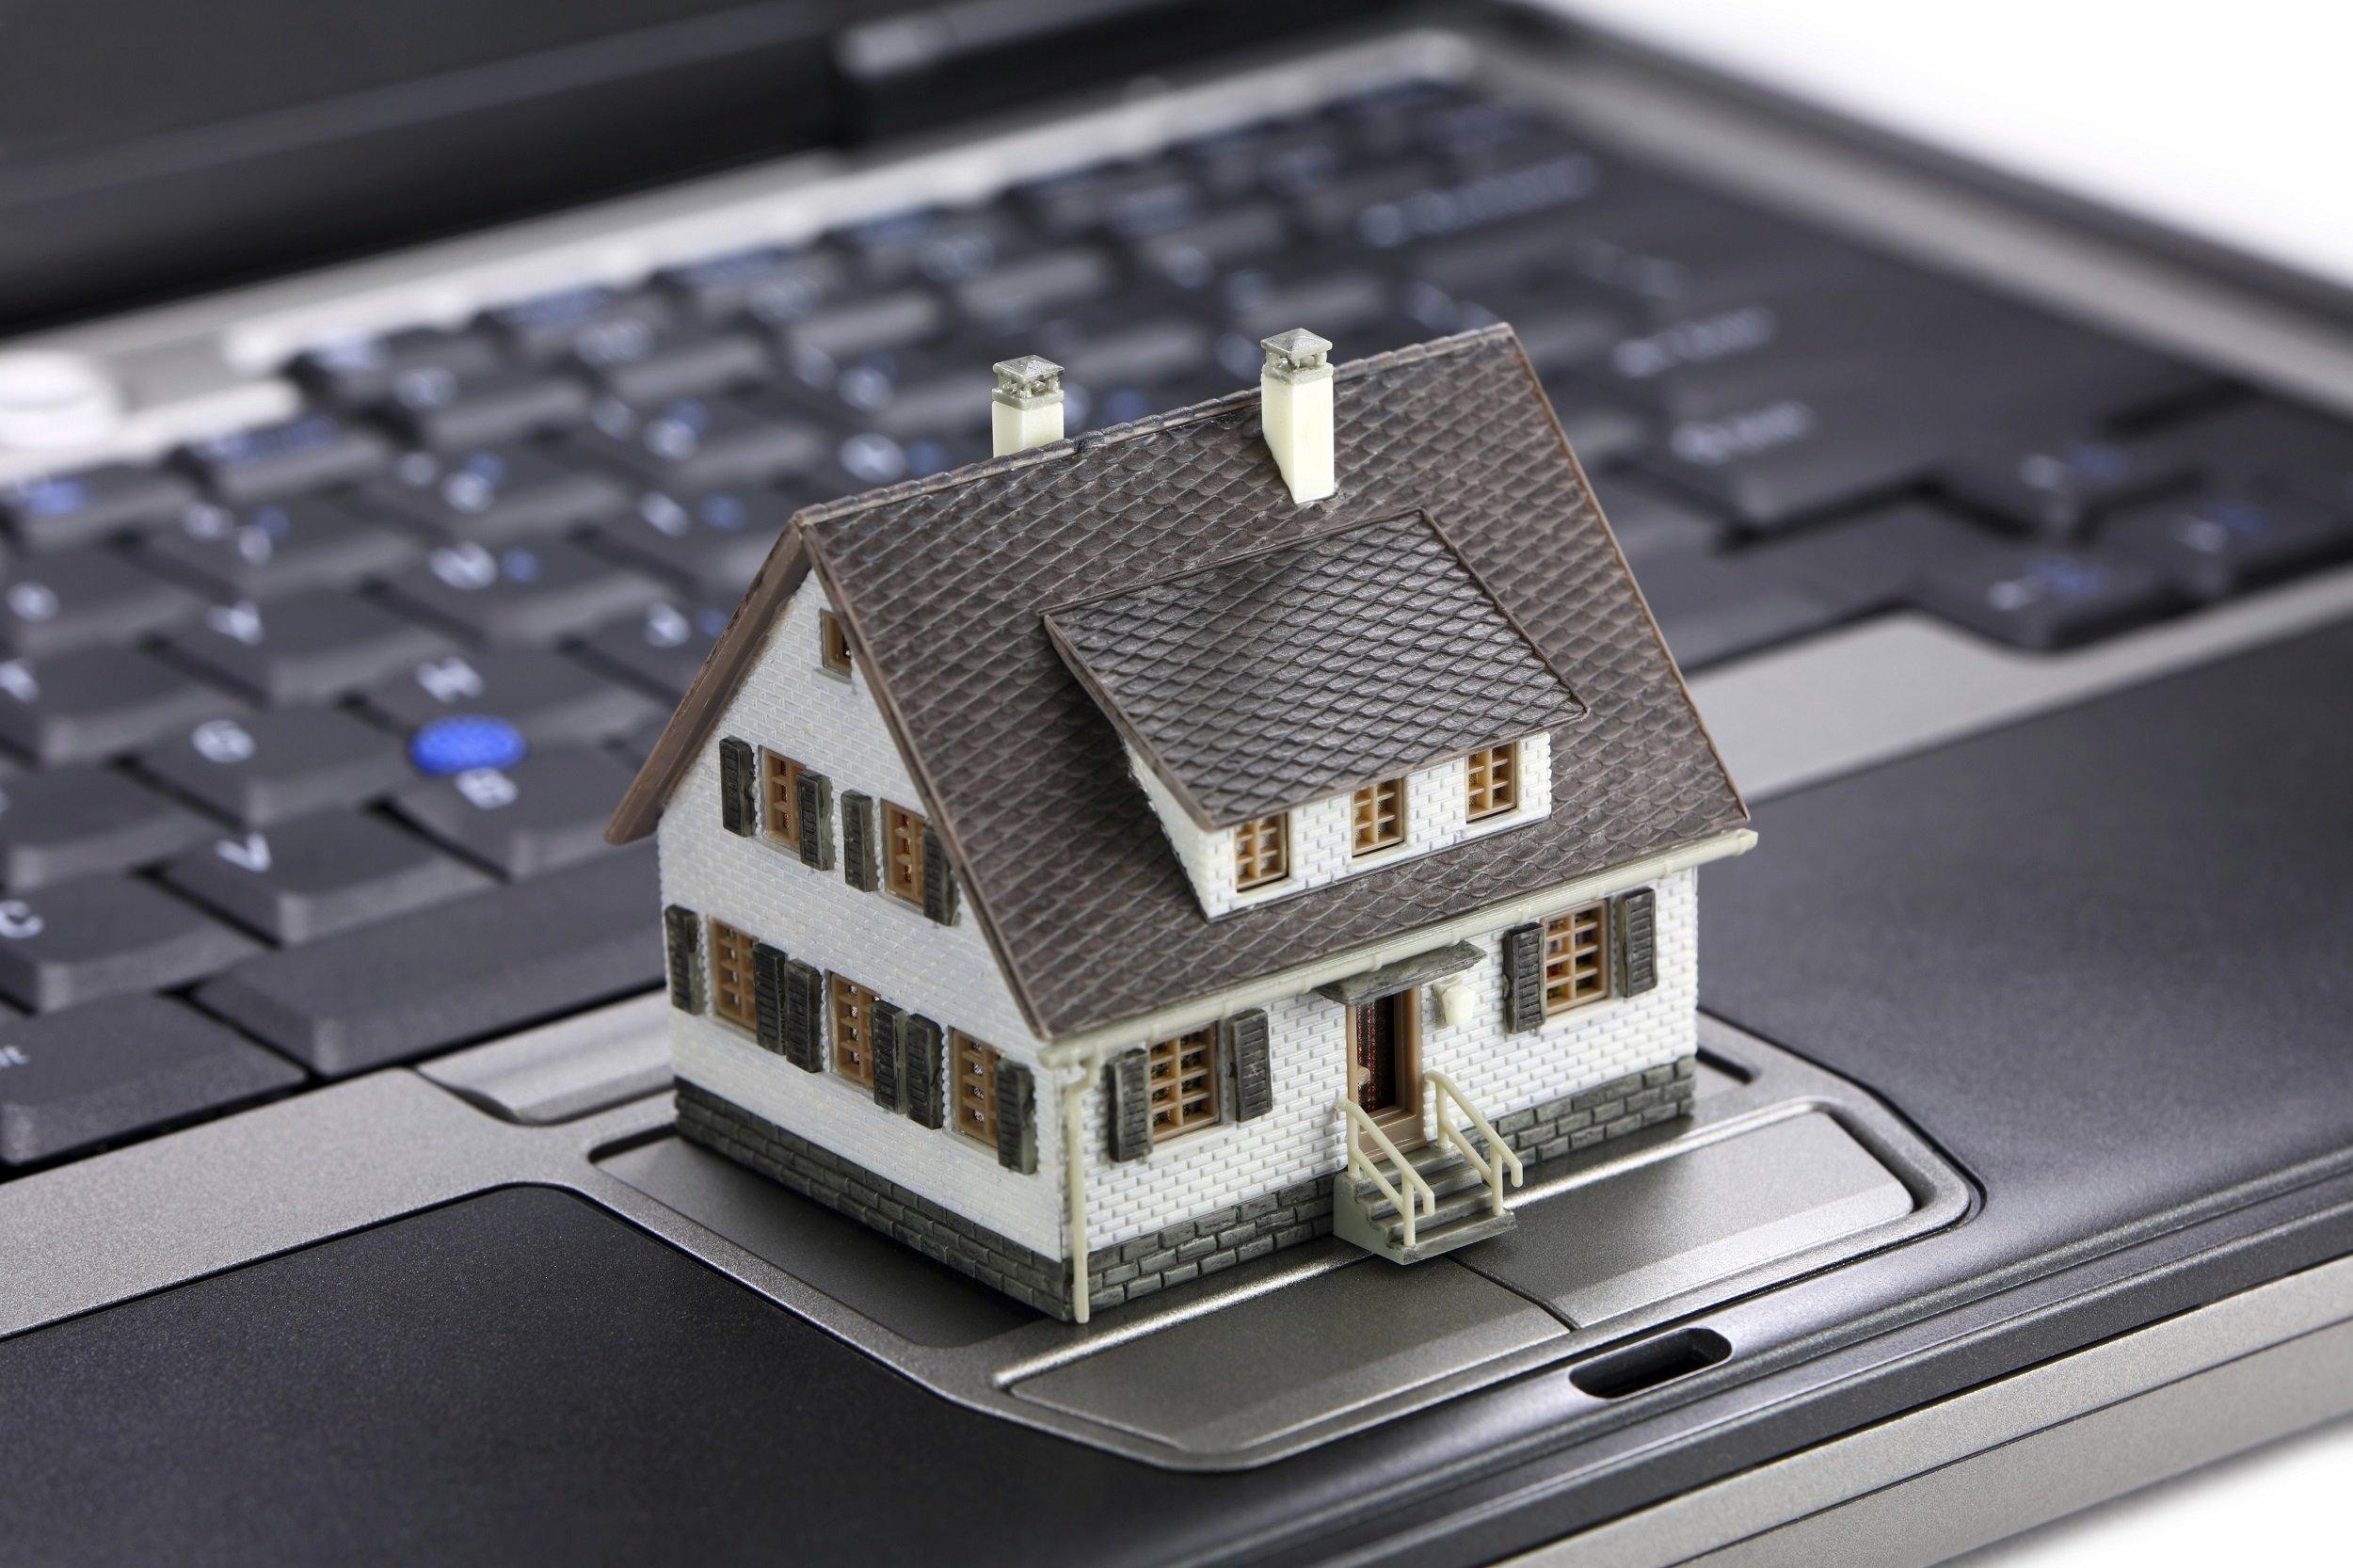 Сайт покупки недвижимости за границей